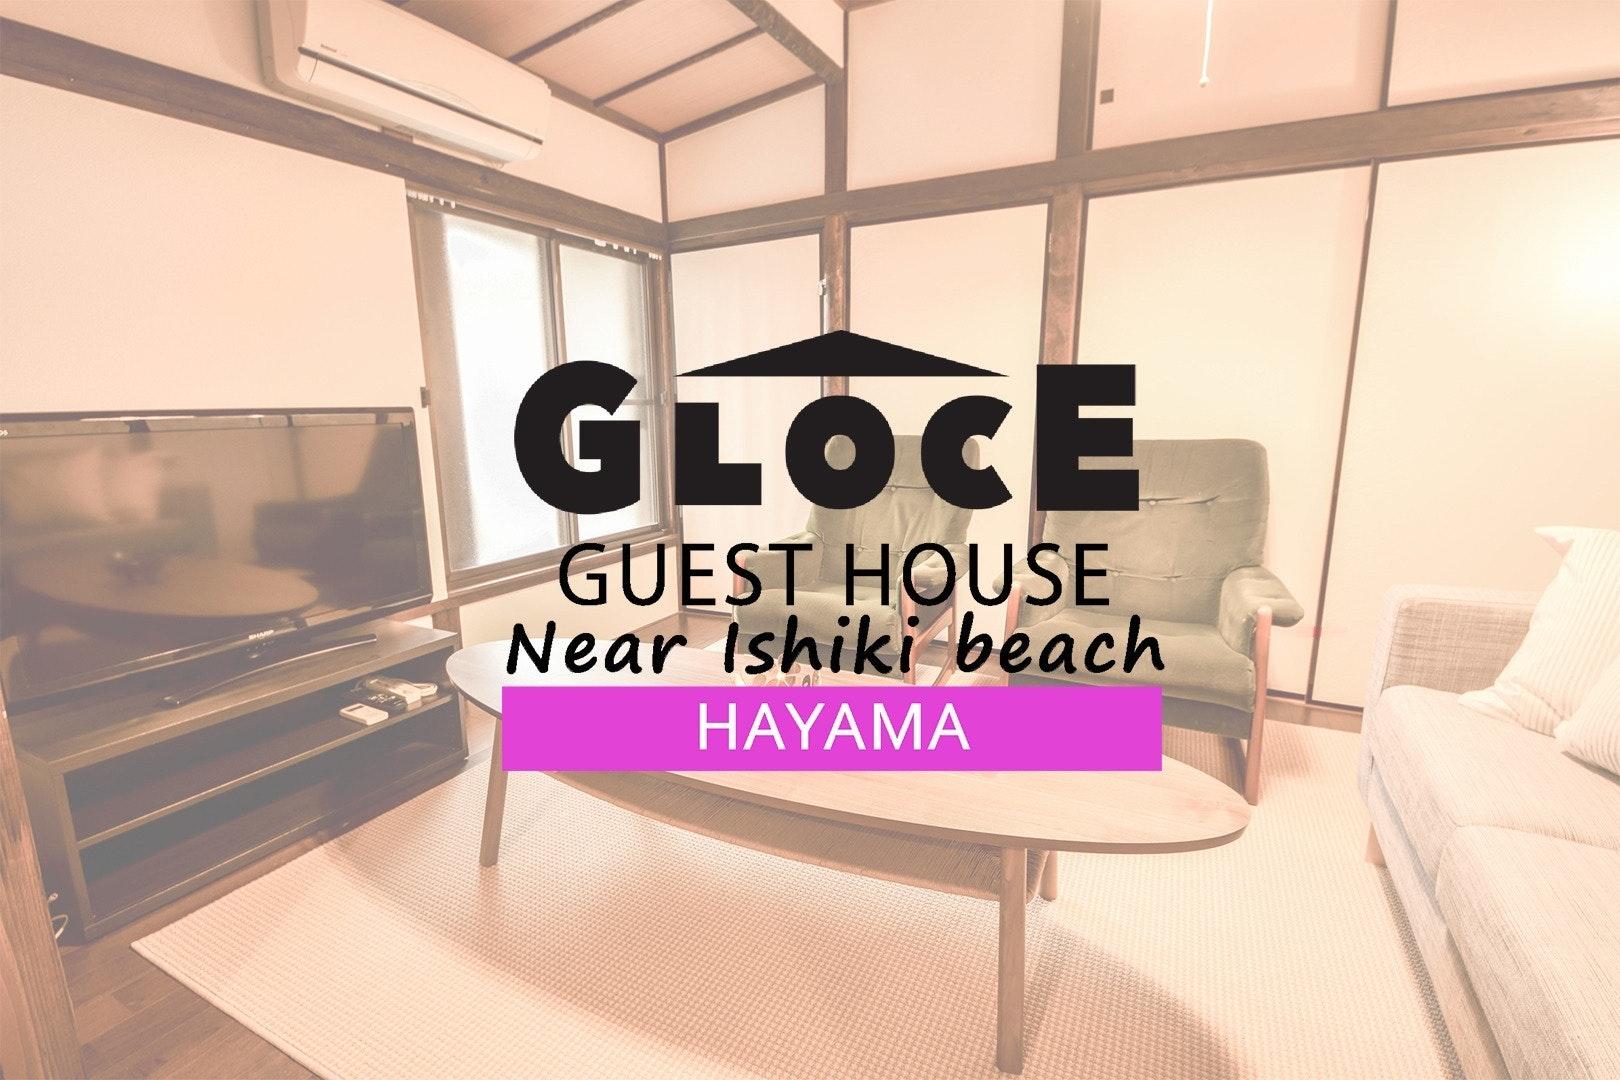 GLOCE ゲストハウス一色 in Hayama